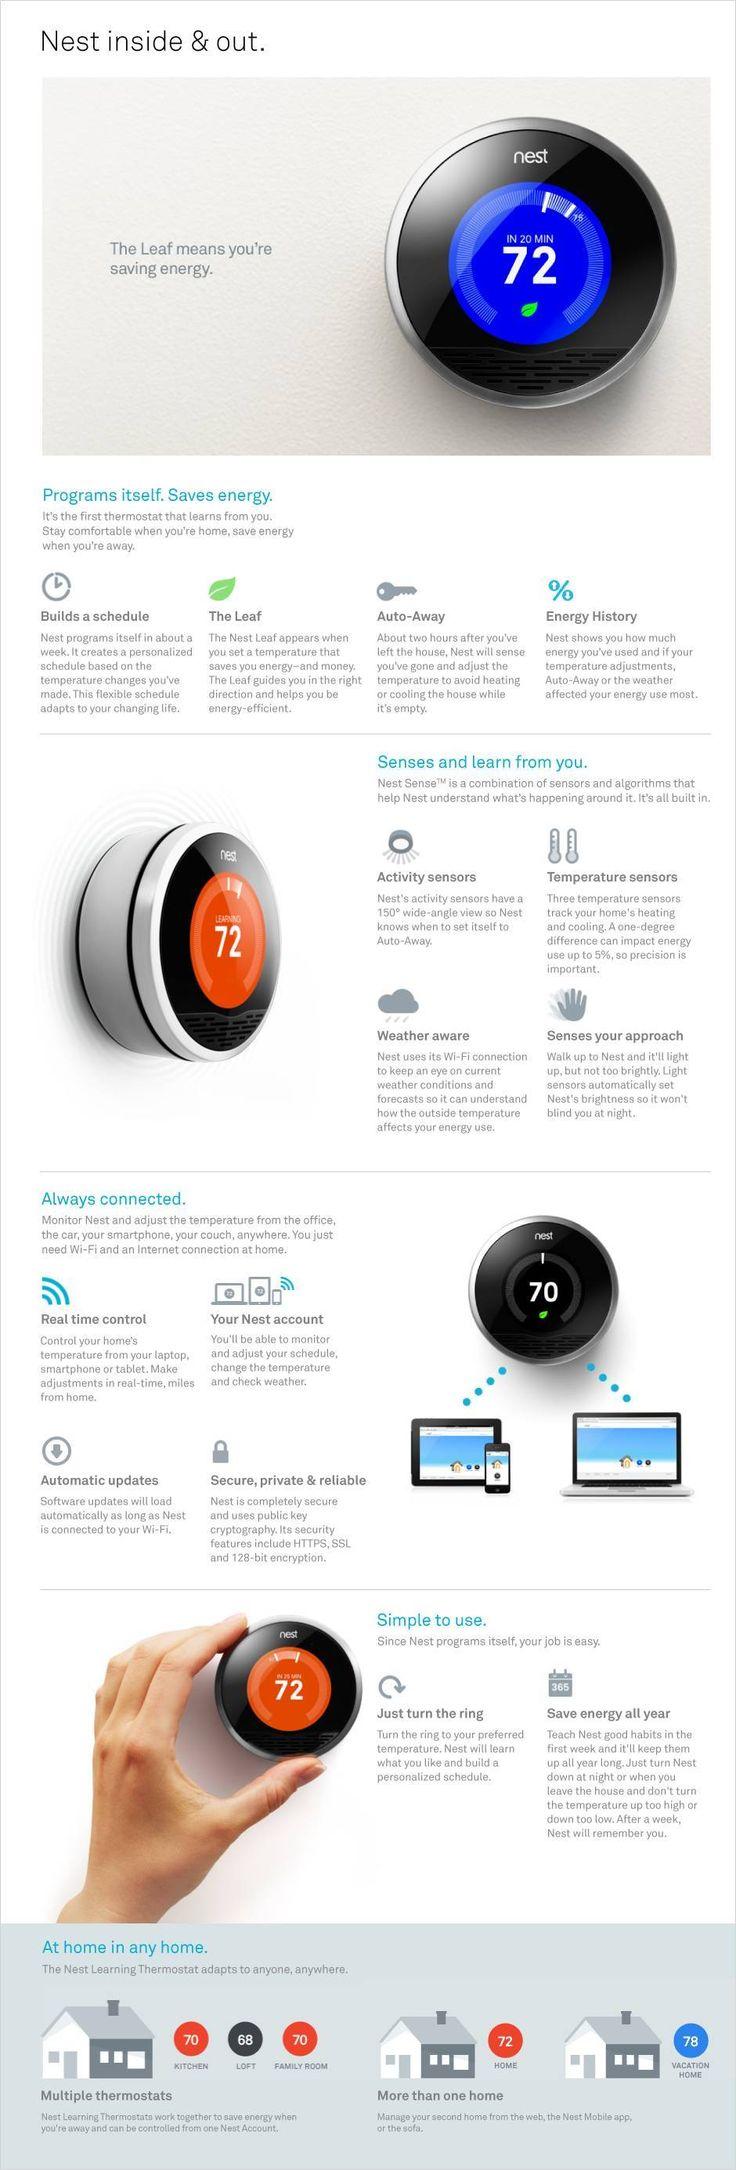 best Smart Home u Gadgets images on Pinterest Appliances Desks